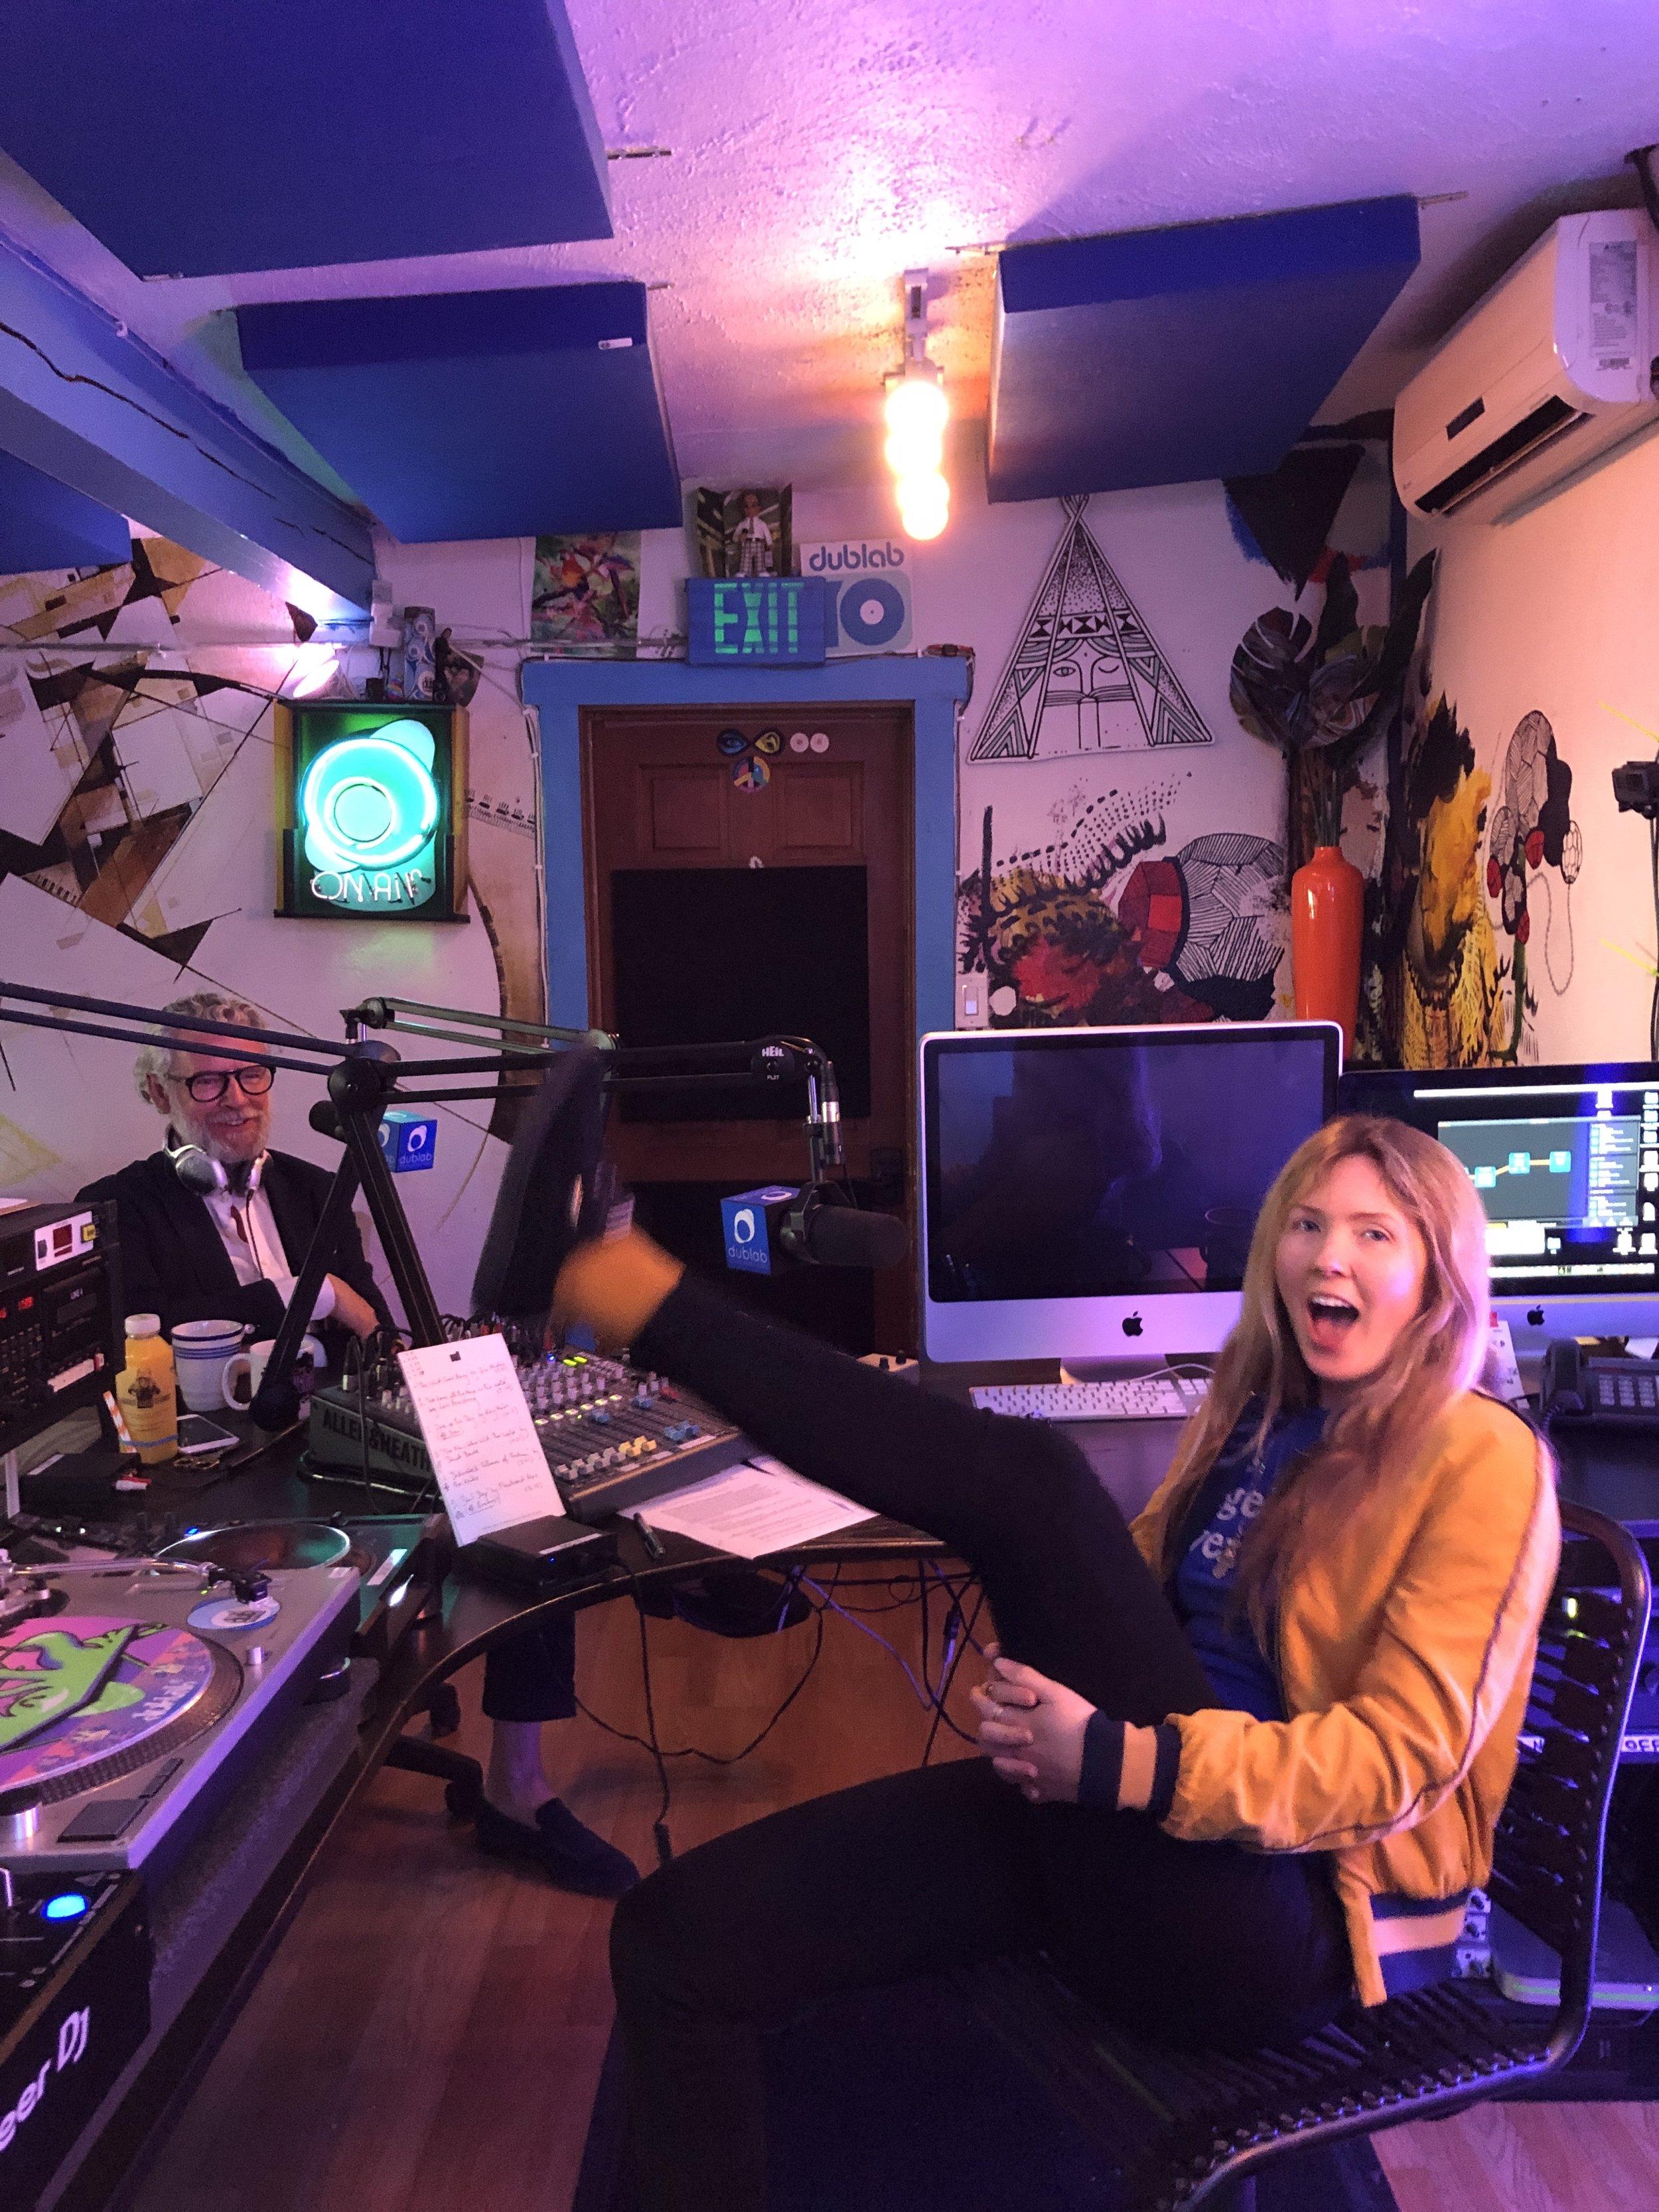 Beatie Wolfe and David Mason on air - LA's dublab Radio